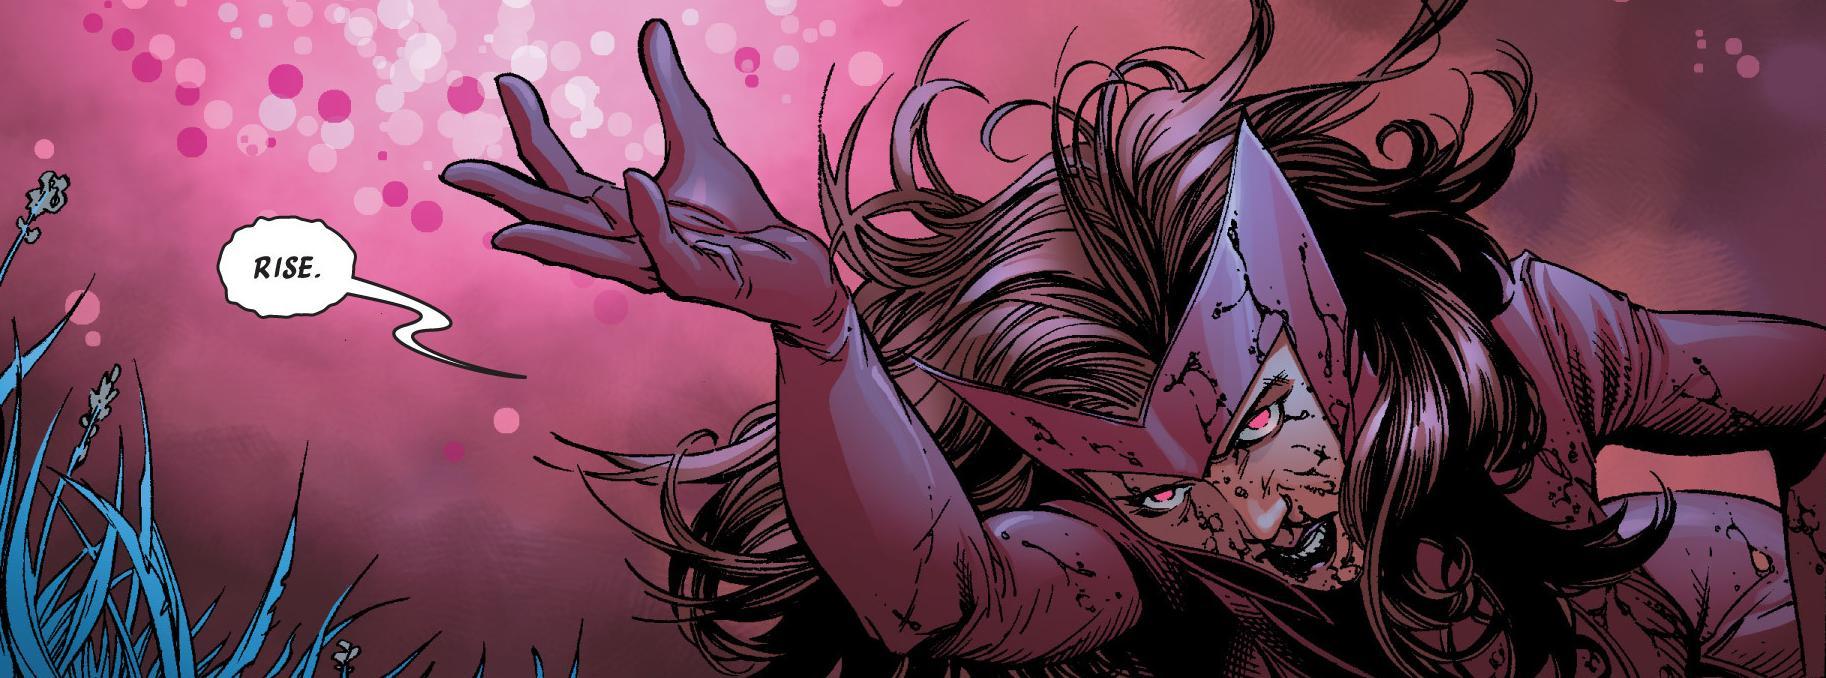 Wanda Maximoff (Earth-13133) from Uncanny Avengers Vol 1 14 002.jpg